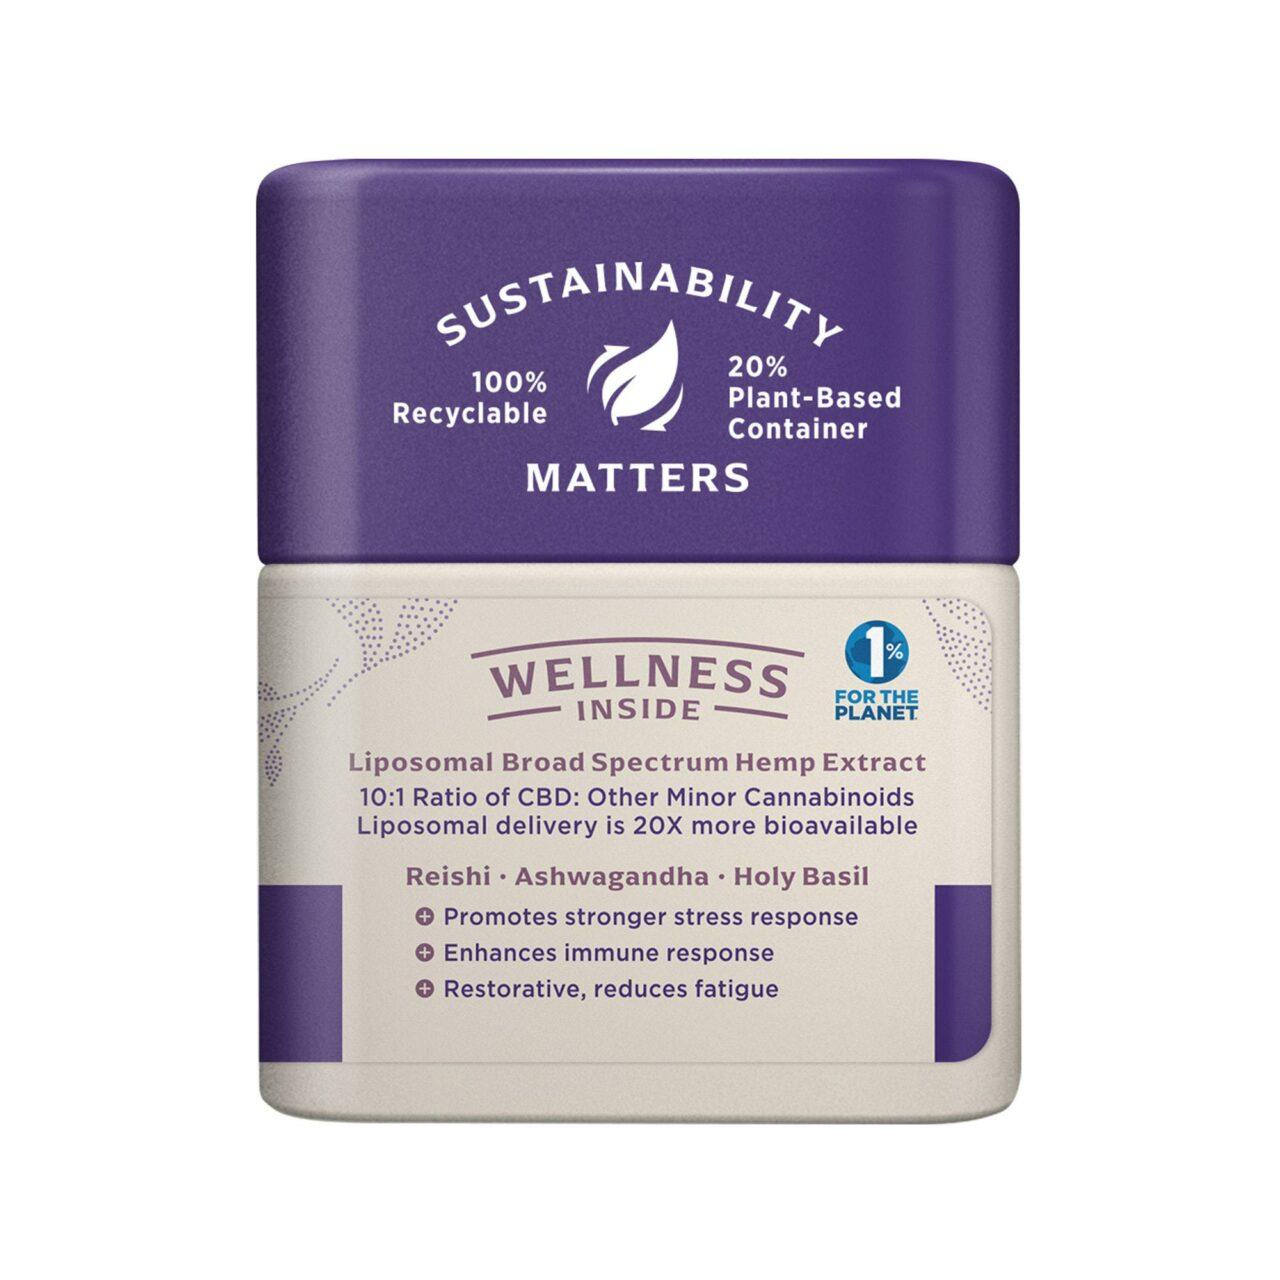 Medterra, Wellness CBD Capsules, Stress Support, Broad Spectrum THC-Free, 30ct, 750mg CBD 2